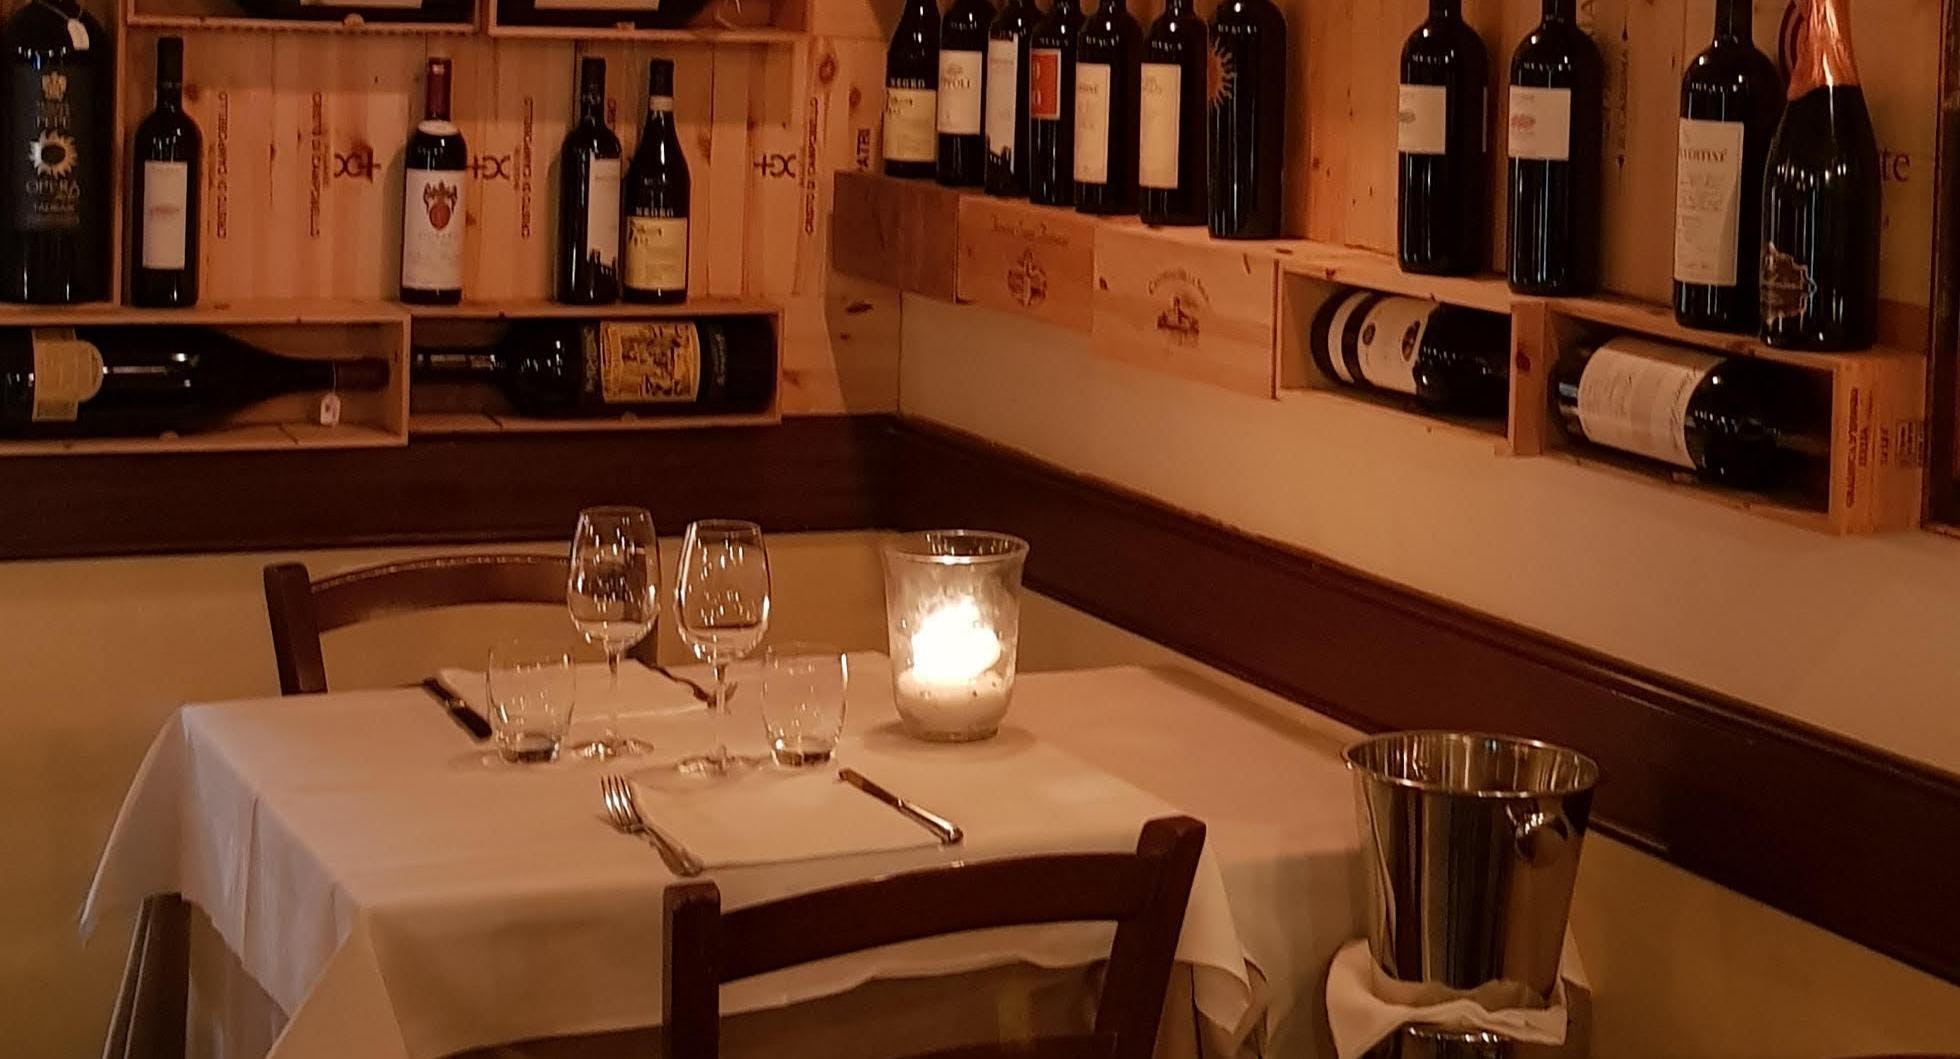 Contrario Vineria Con Cucina Roma image 1